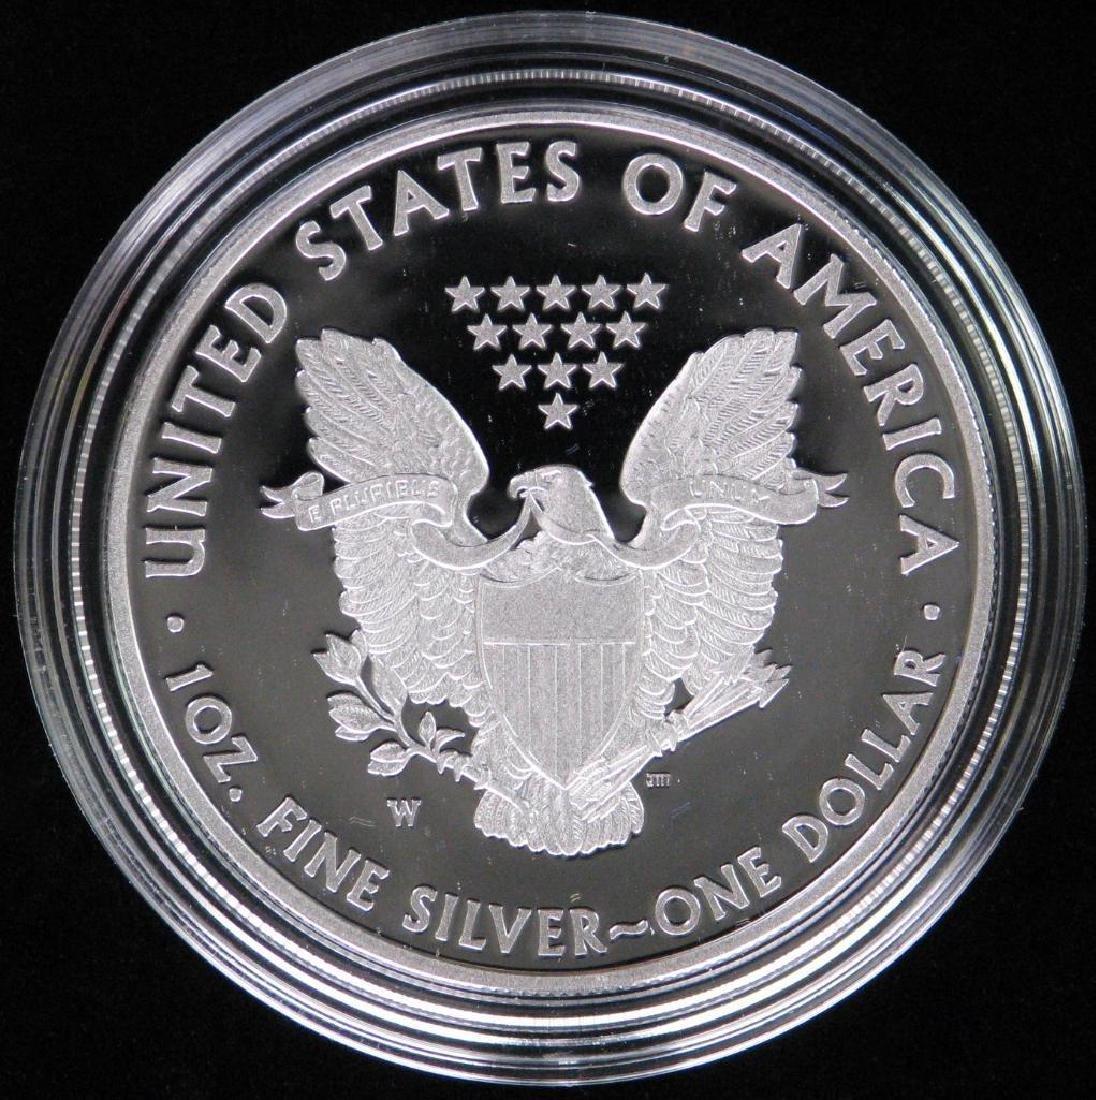 2014-W American Silver Eagle - Proof - 2